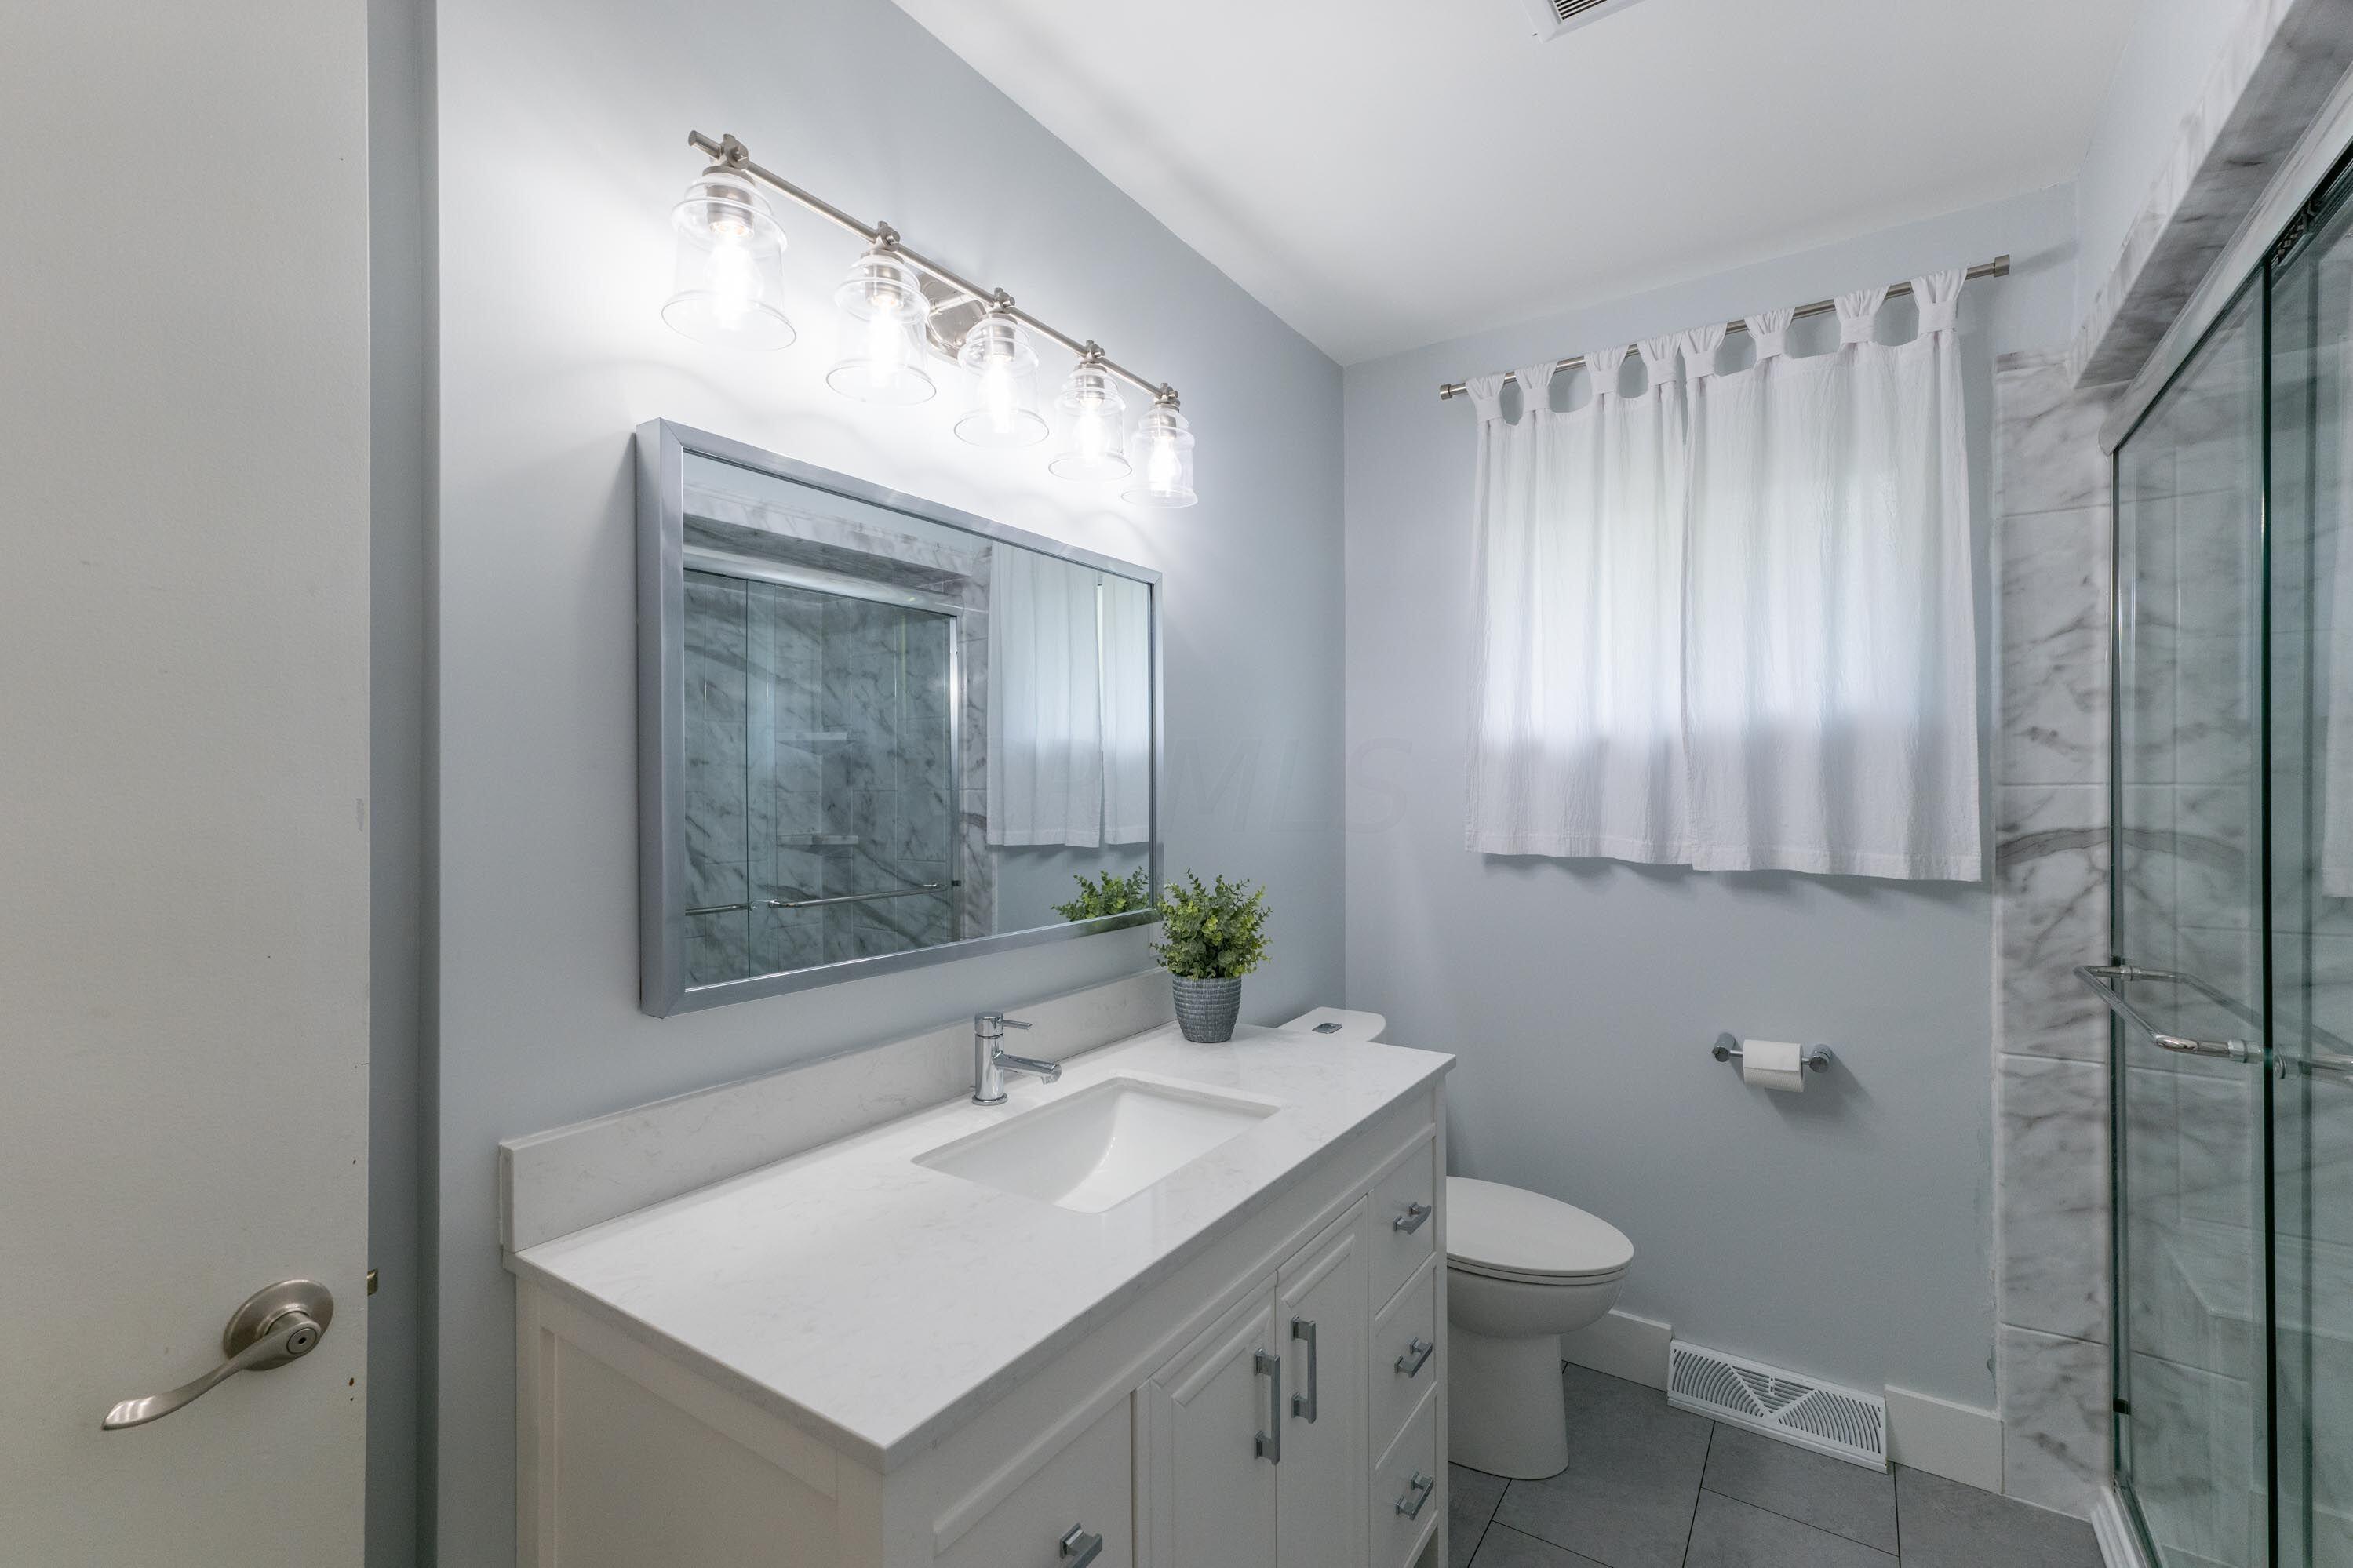 New vanity with granite top